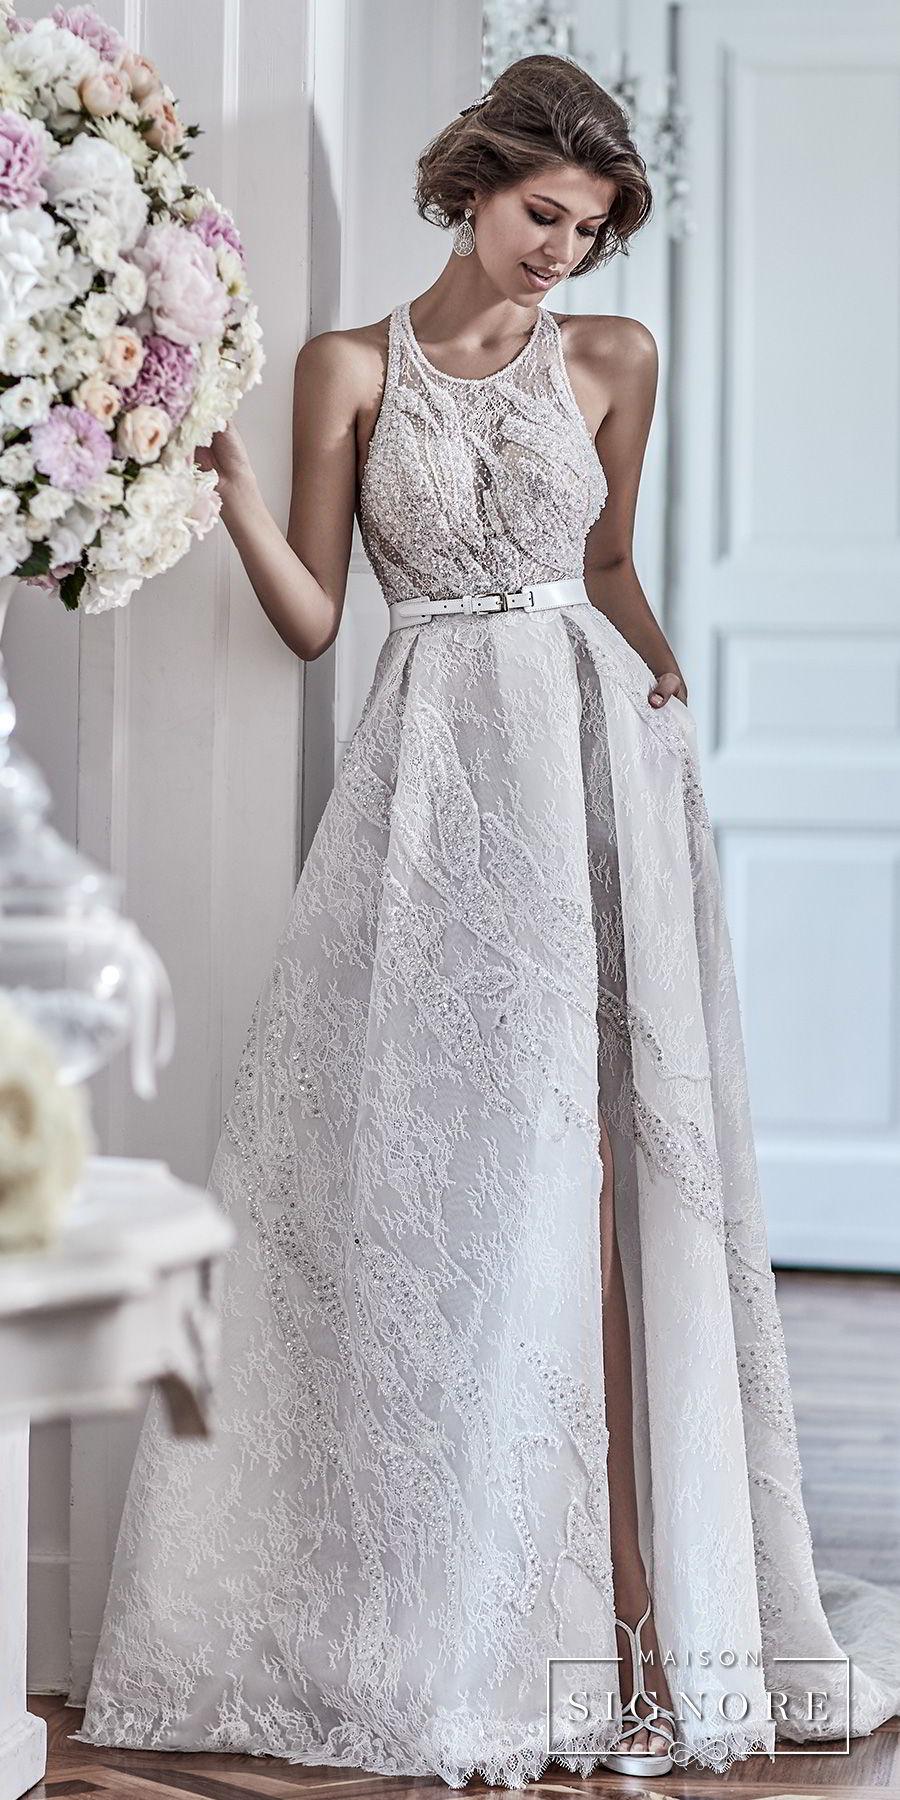 Maison Signore 2018 Bridal Sleeveless Halter Jewel Neck Full Embellishment Elegant A Line Wedding Dress With